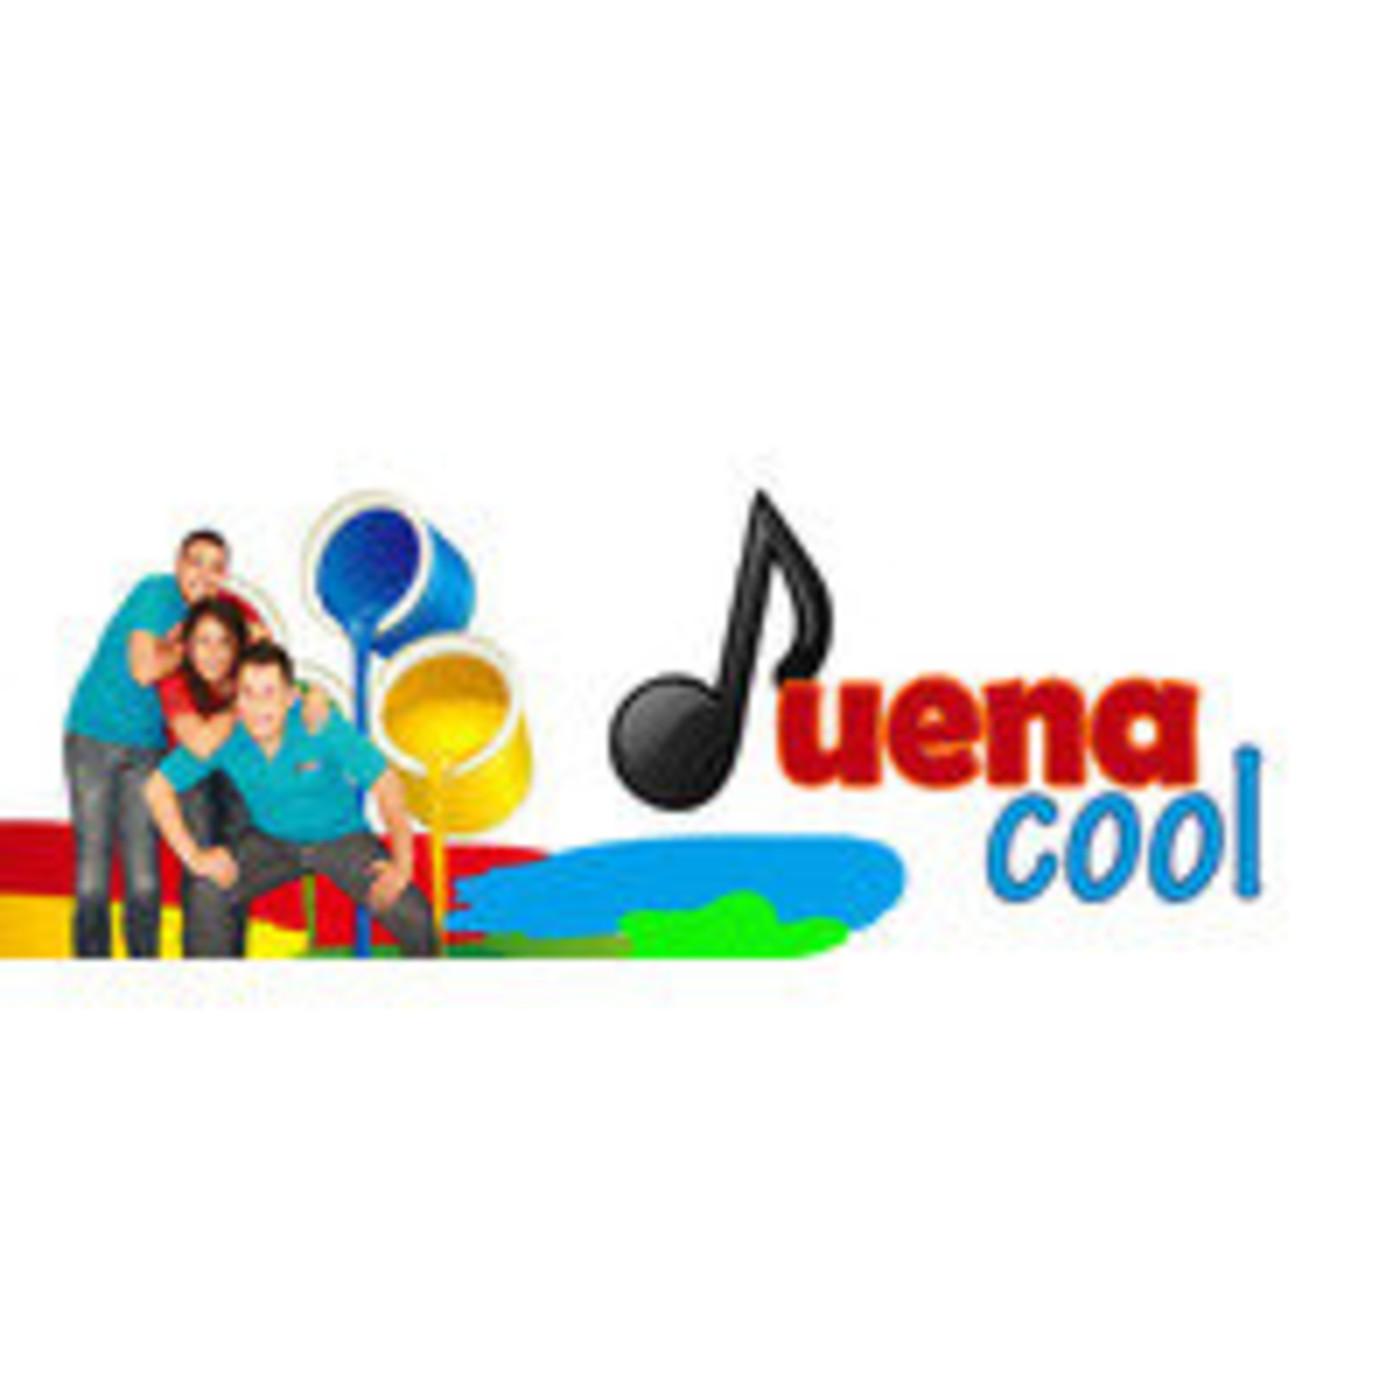 <![CDATA[Podcast Suena Cool]]>